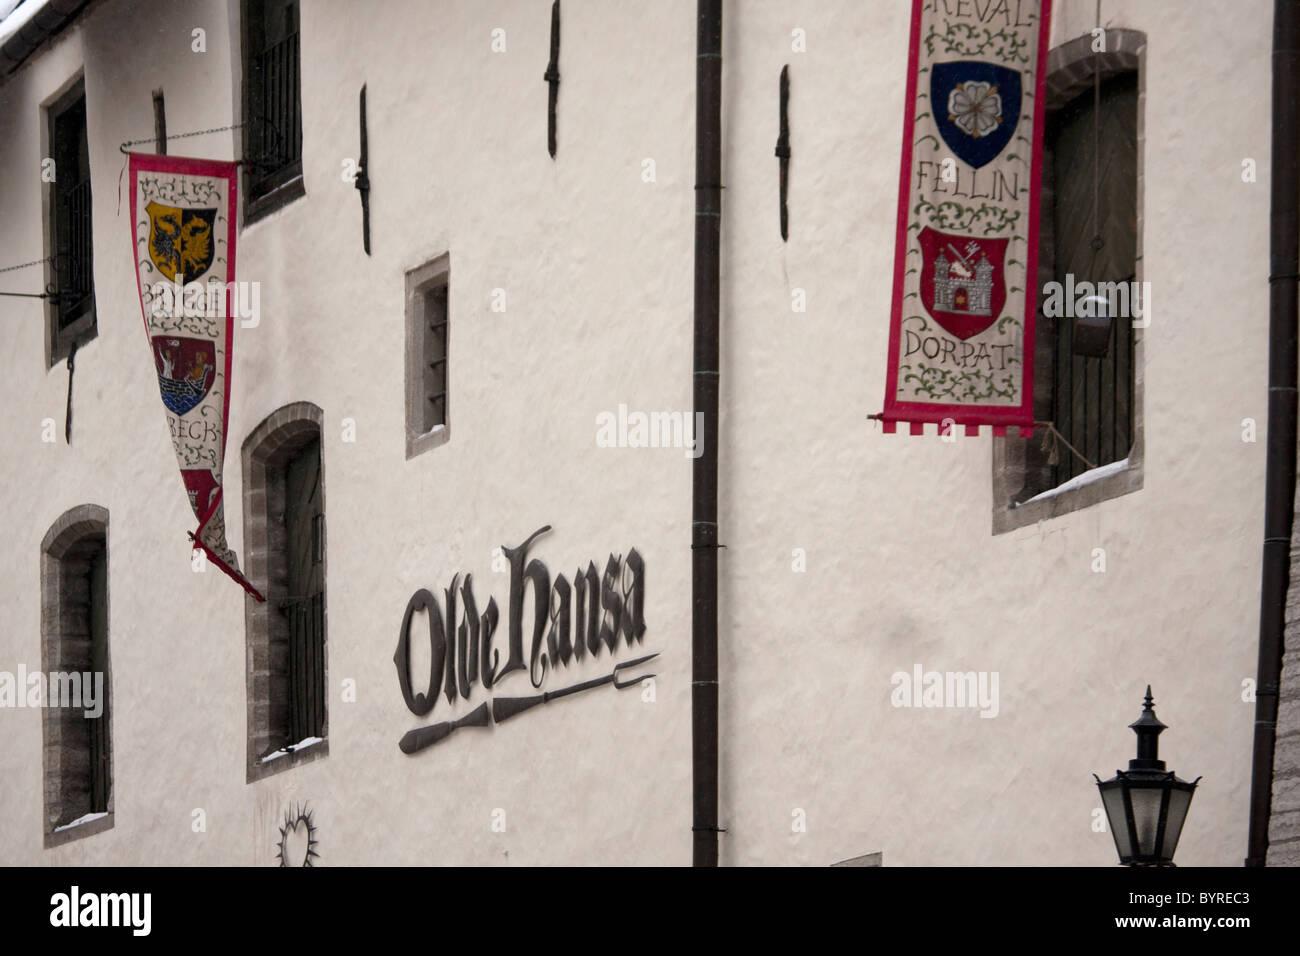 Olds Hansa Medieval Restaurant, Old Town Tallinn, Estonia - Stock Image